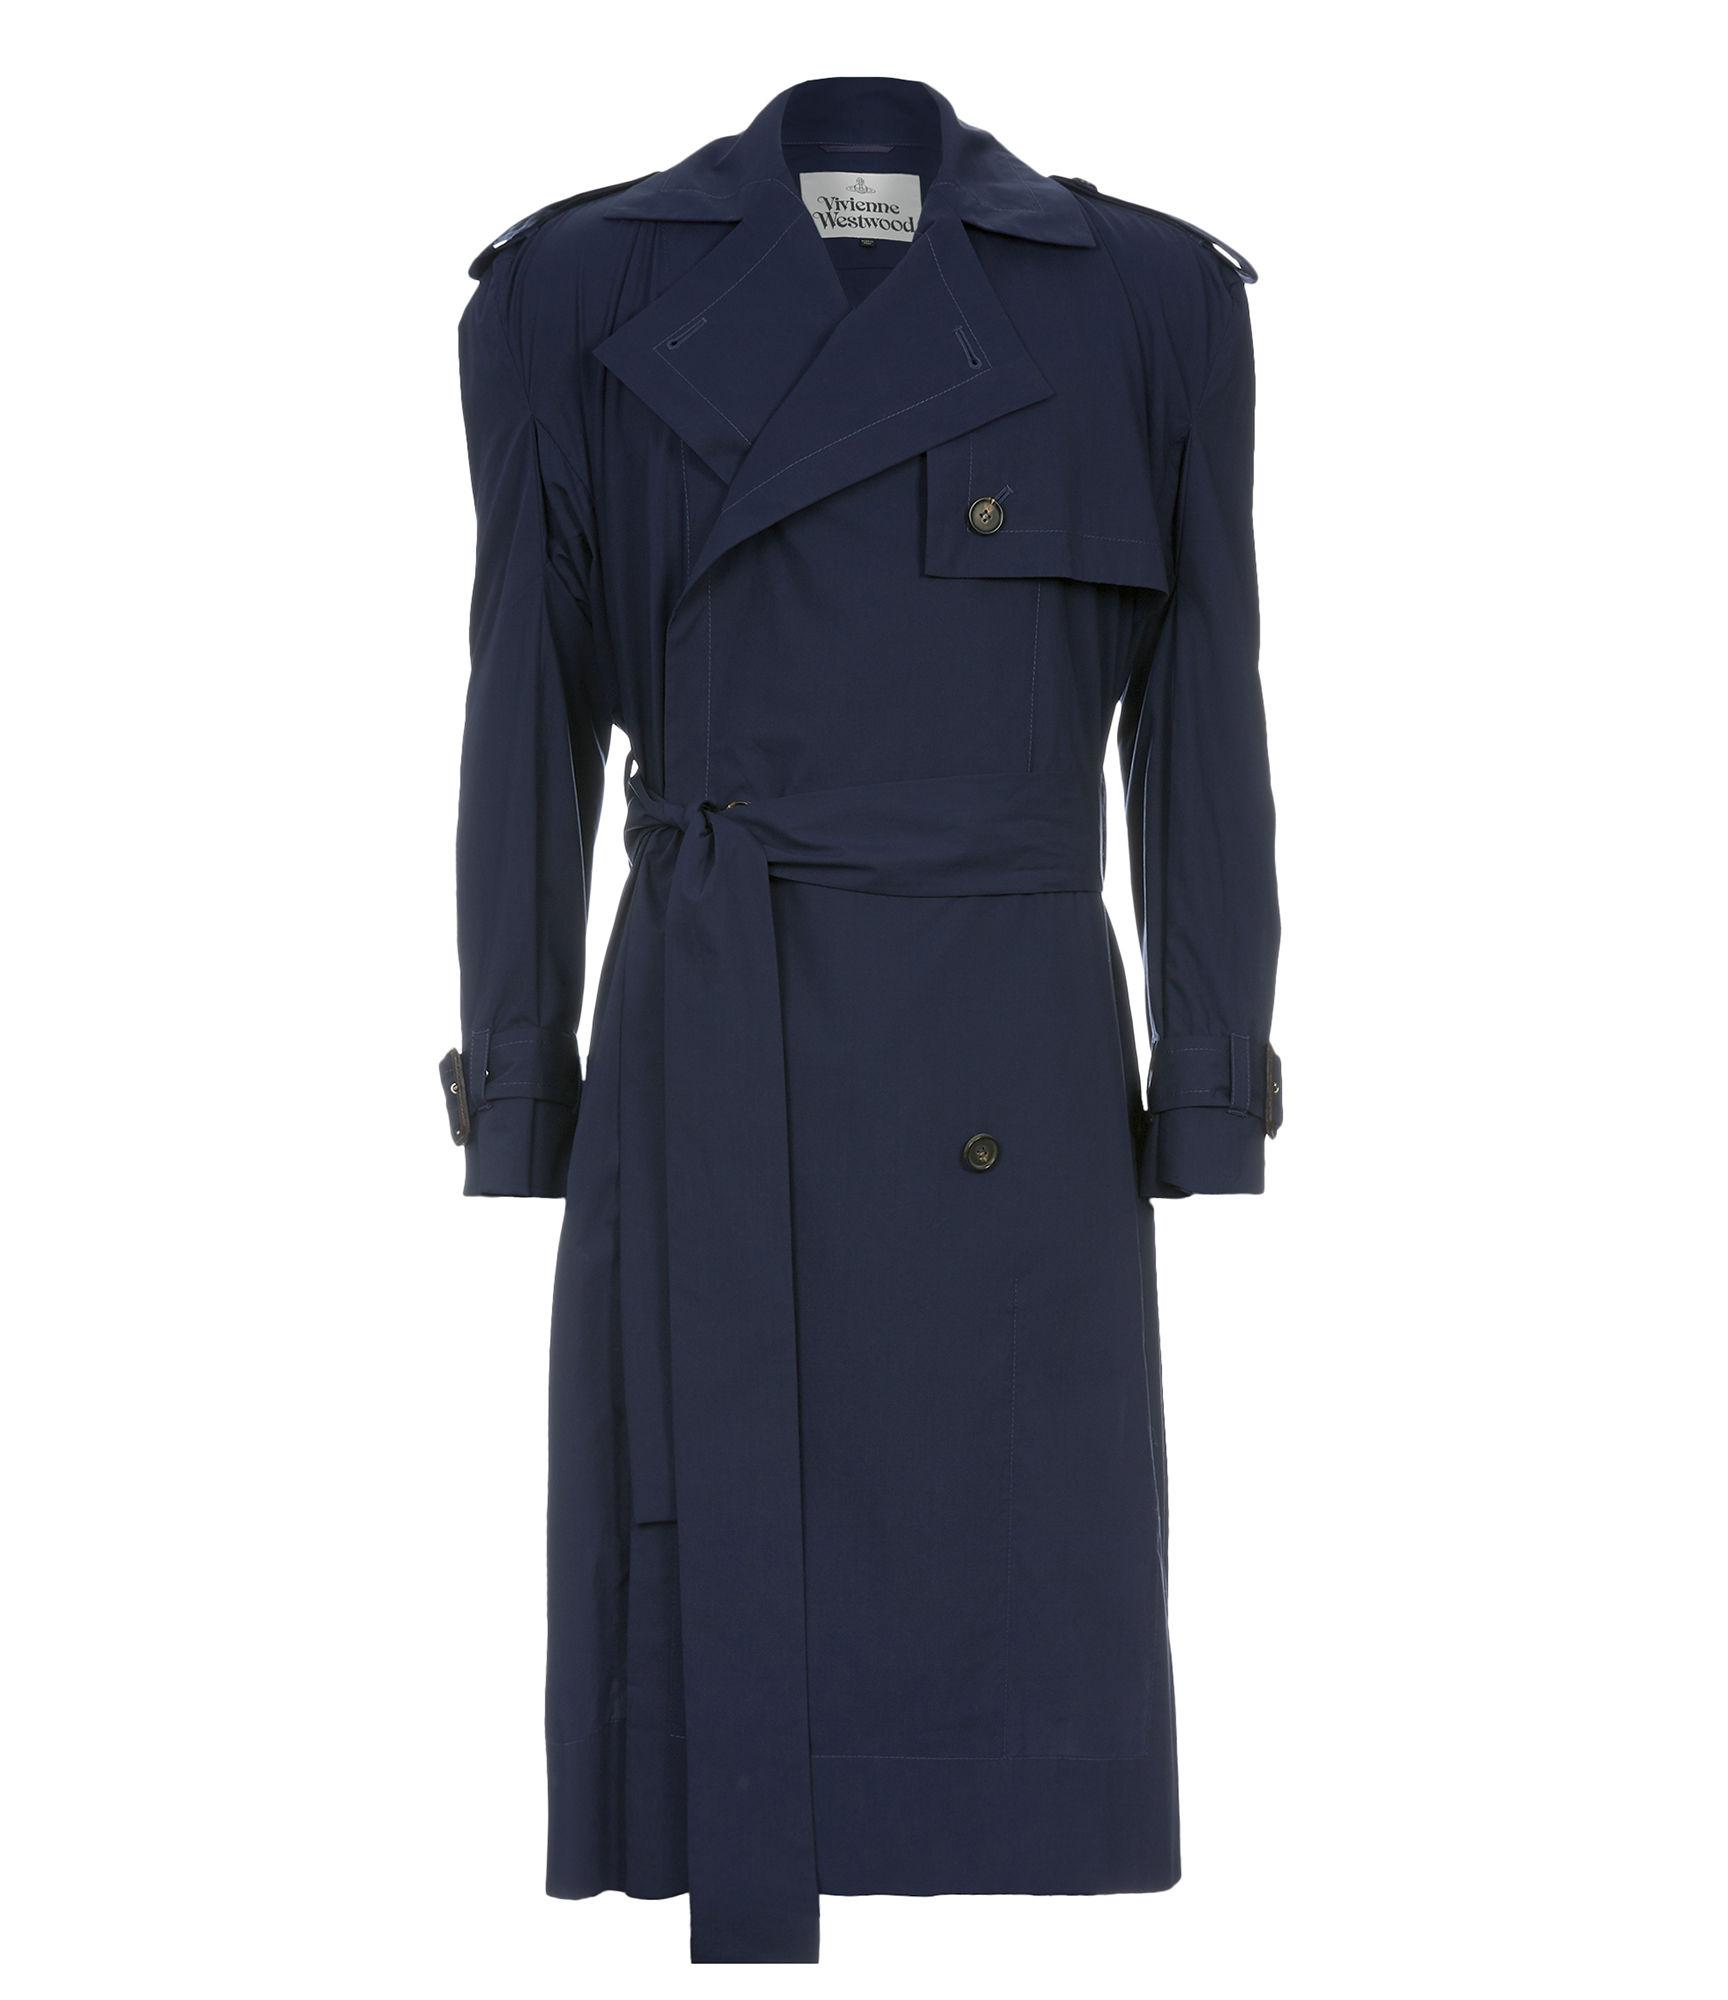 Vivienne Westwood Gabelle Trench Coat Navy